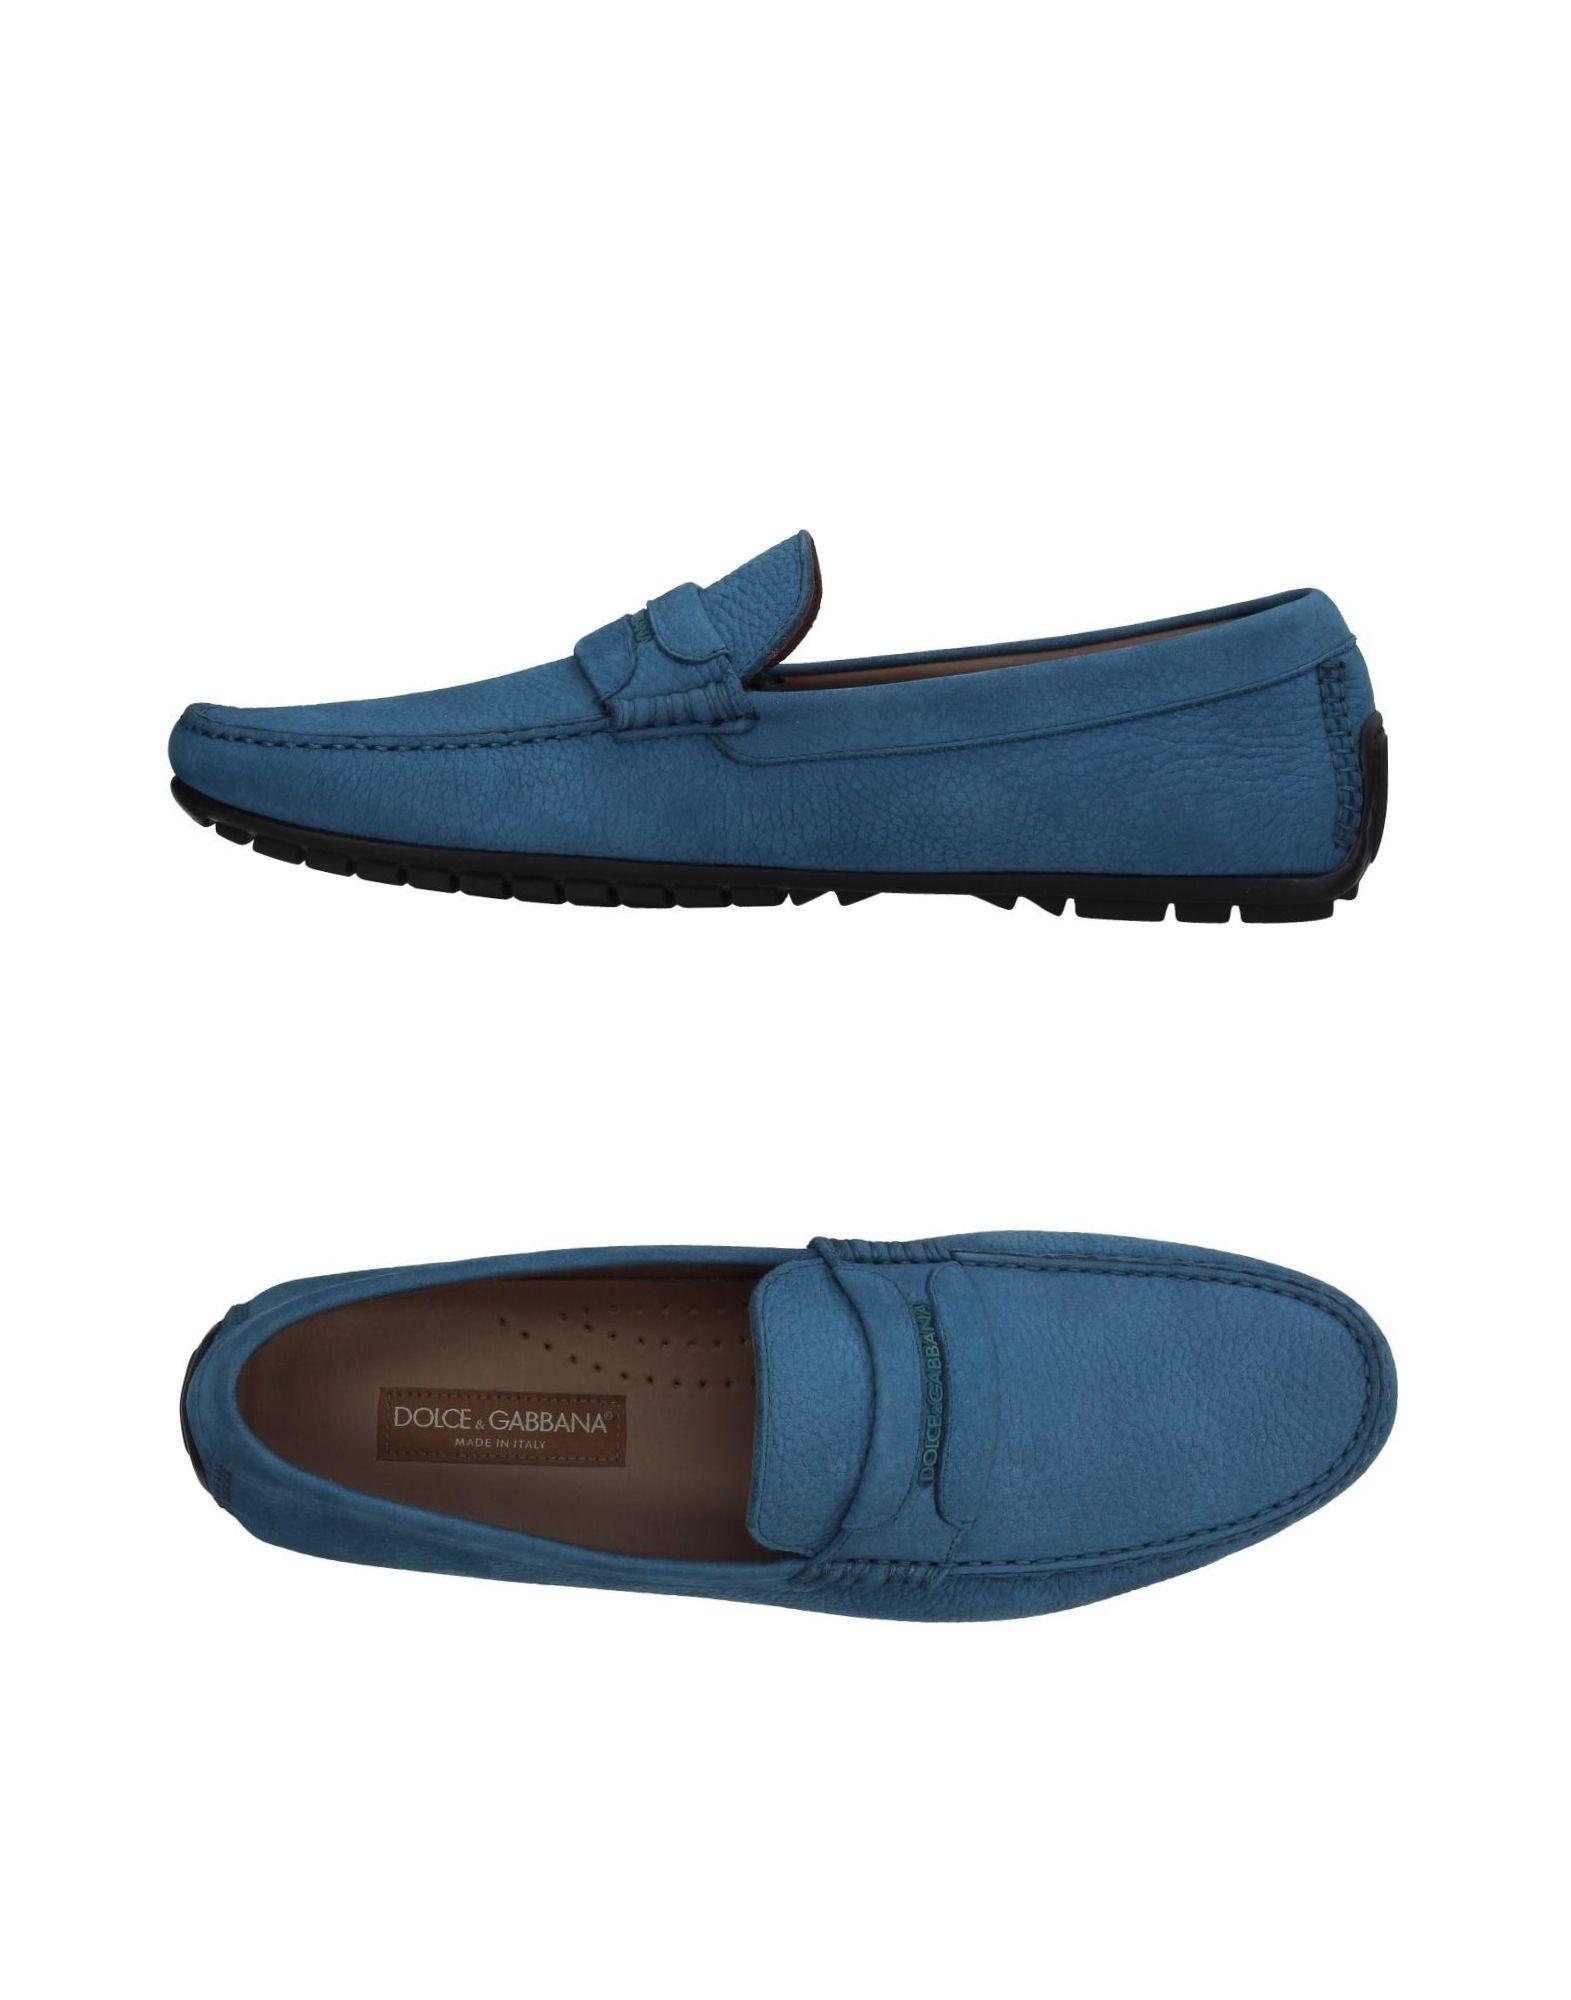 Mocassino Dolce & Gabbana Uomo 11402026HT - 11402026HT Uomo be06c1